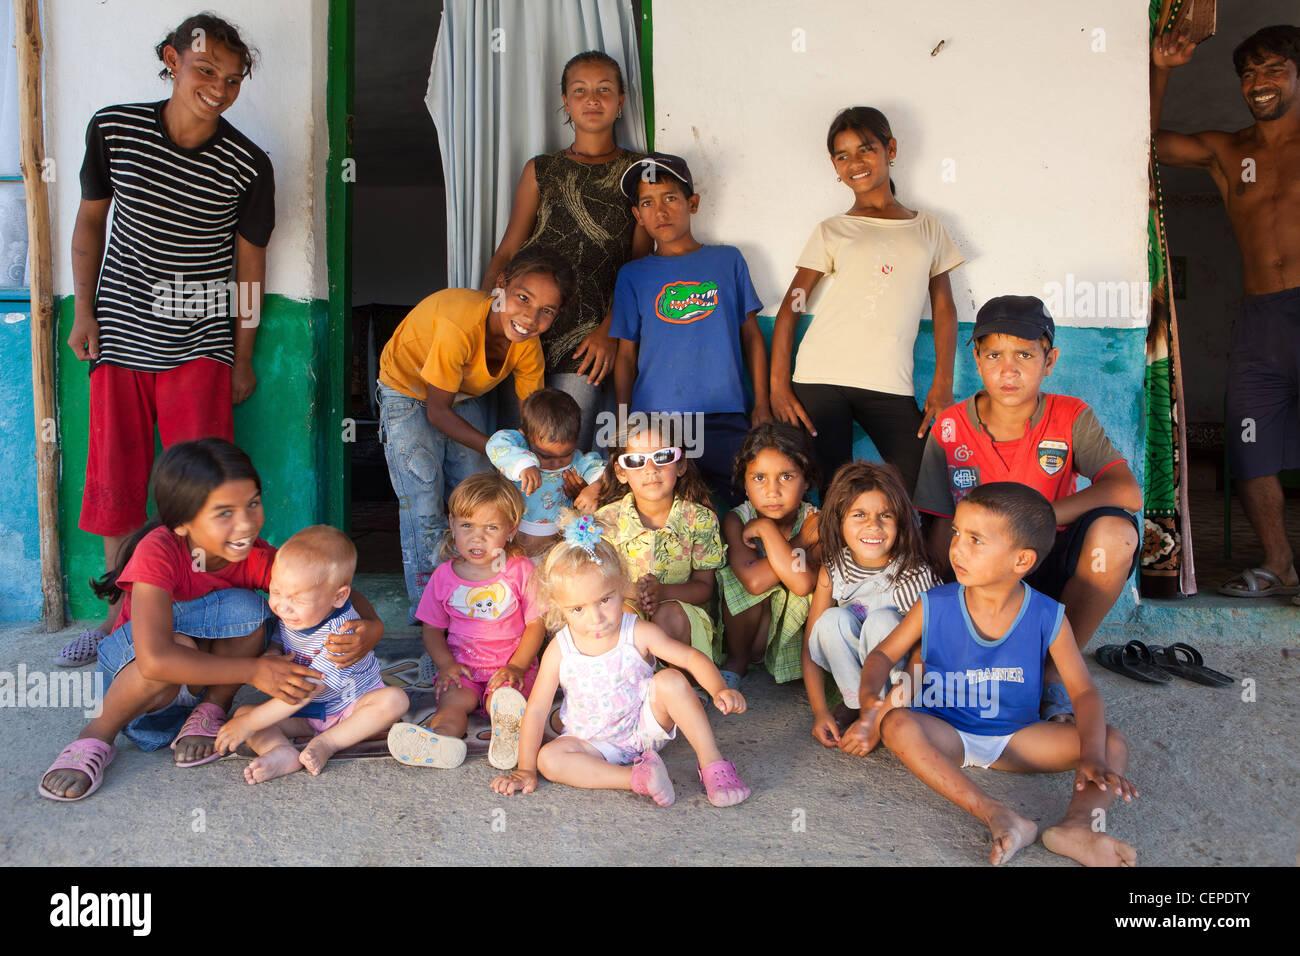 Bulgarian family of Roma Gypsies - Stock Image